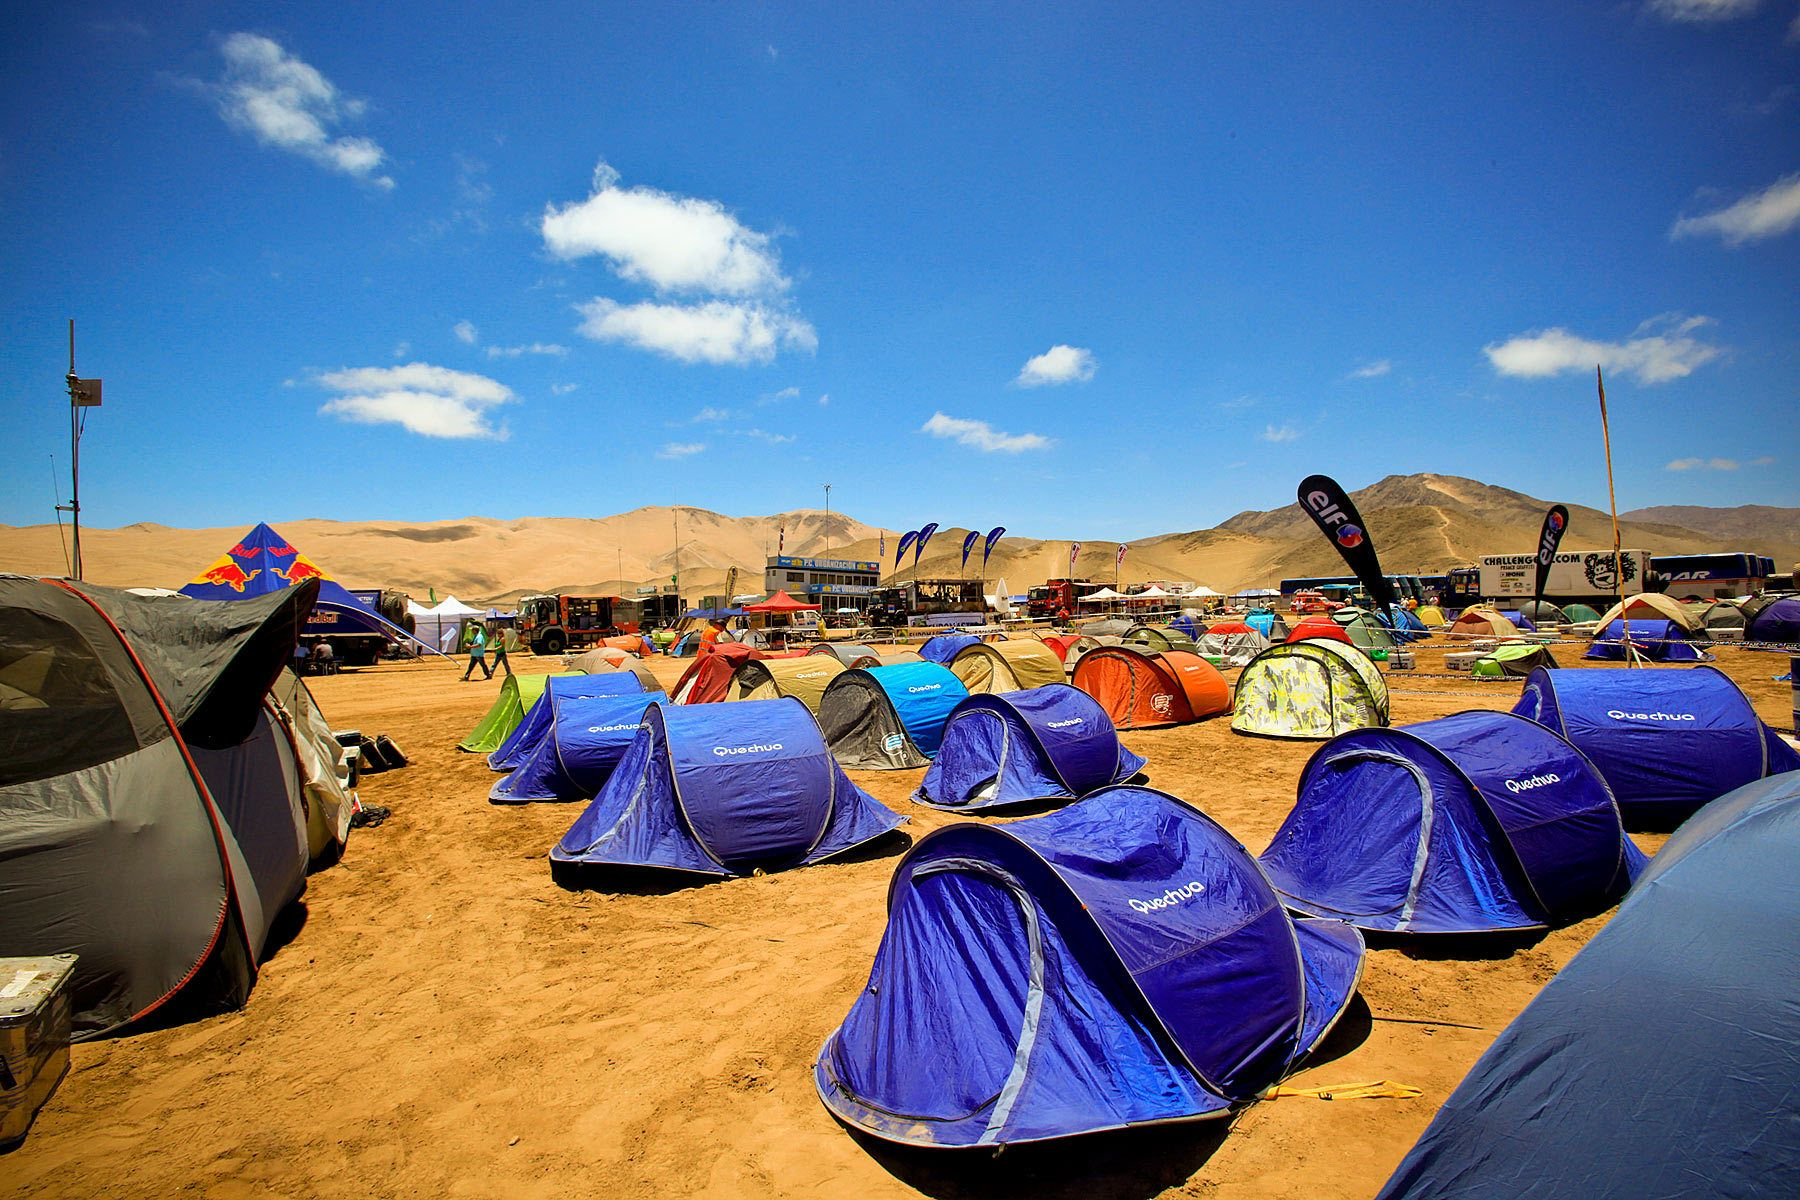 Atacama BivouacBasecampChile